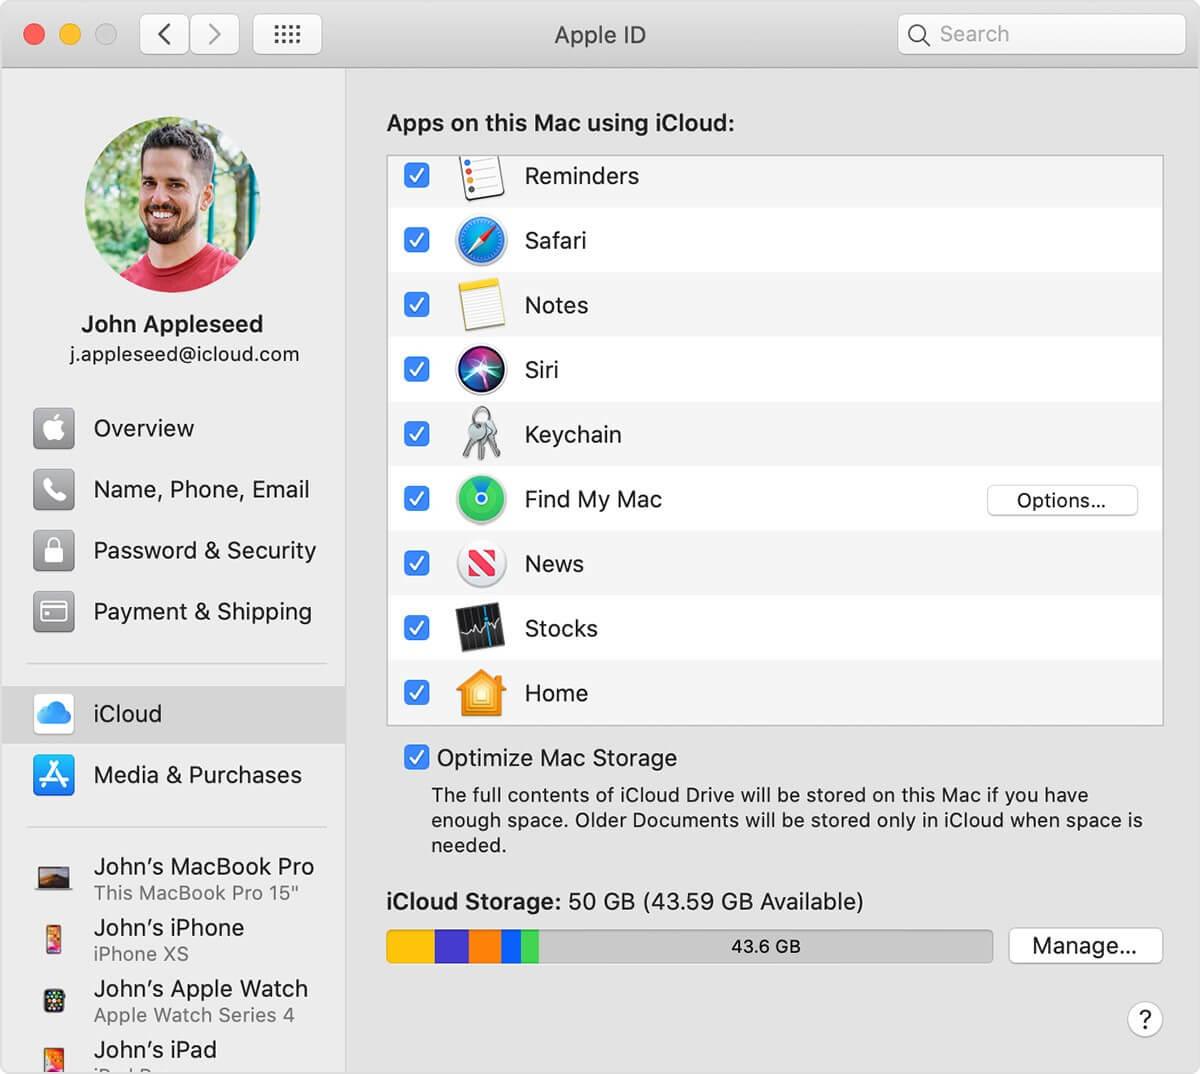 find my mac option